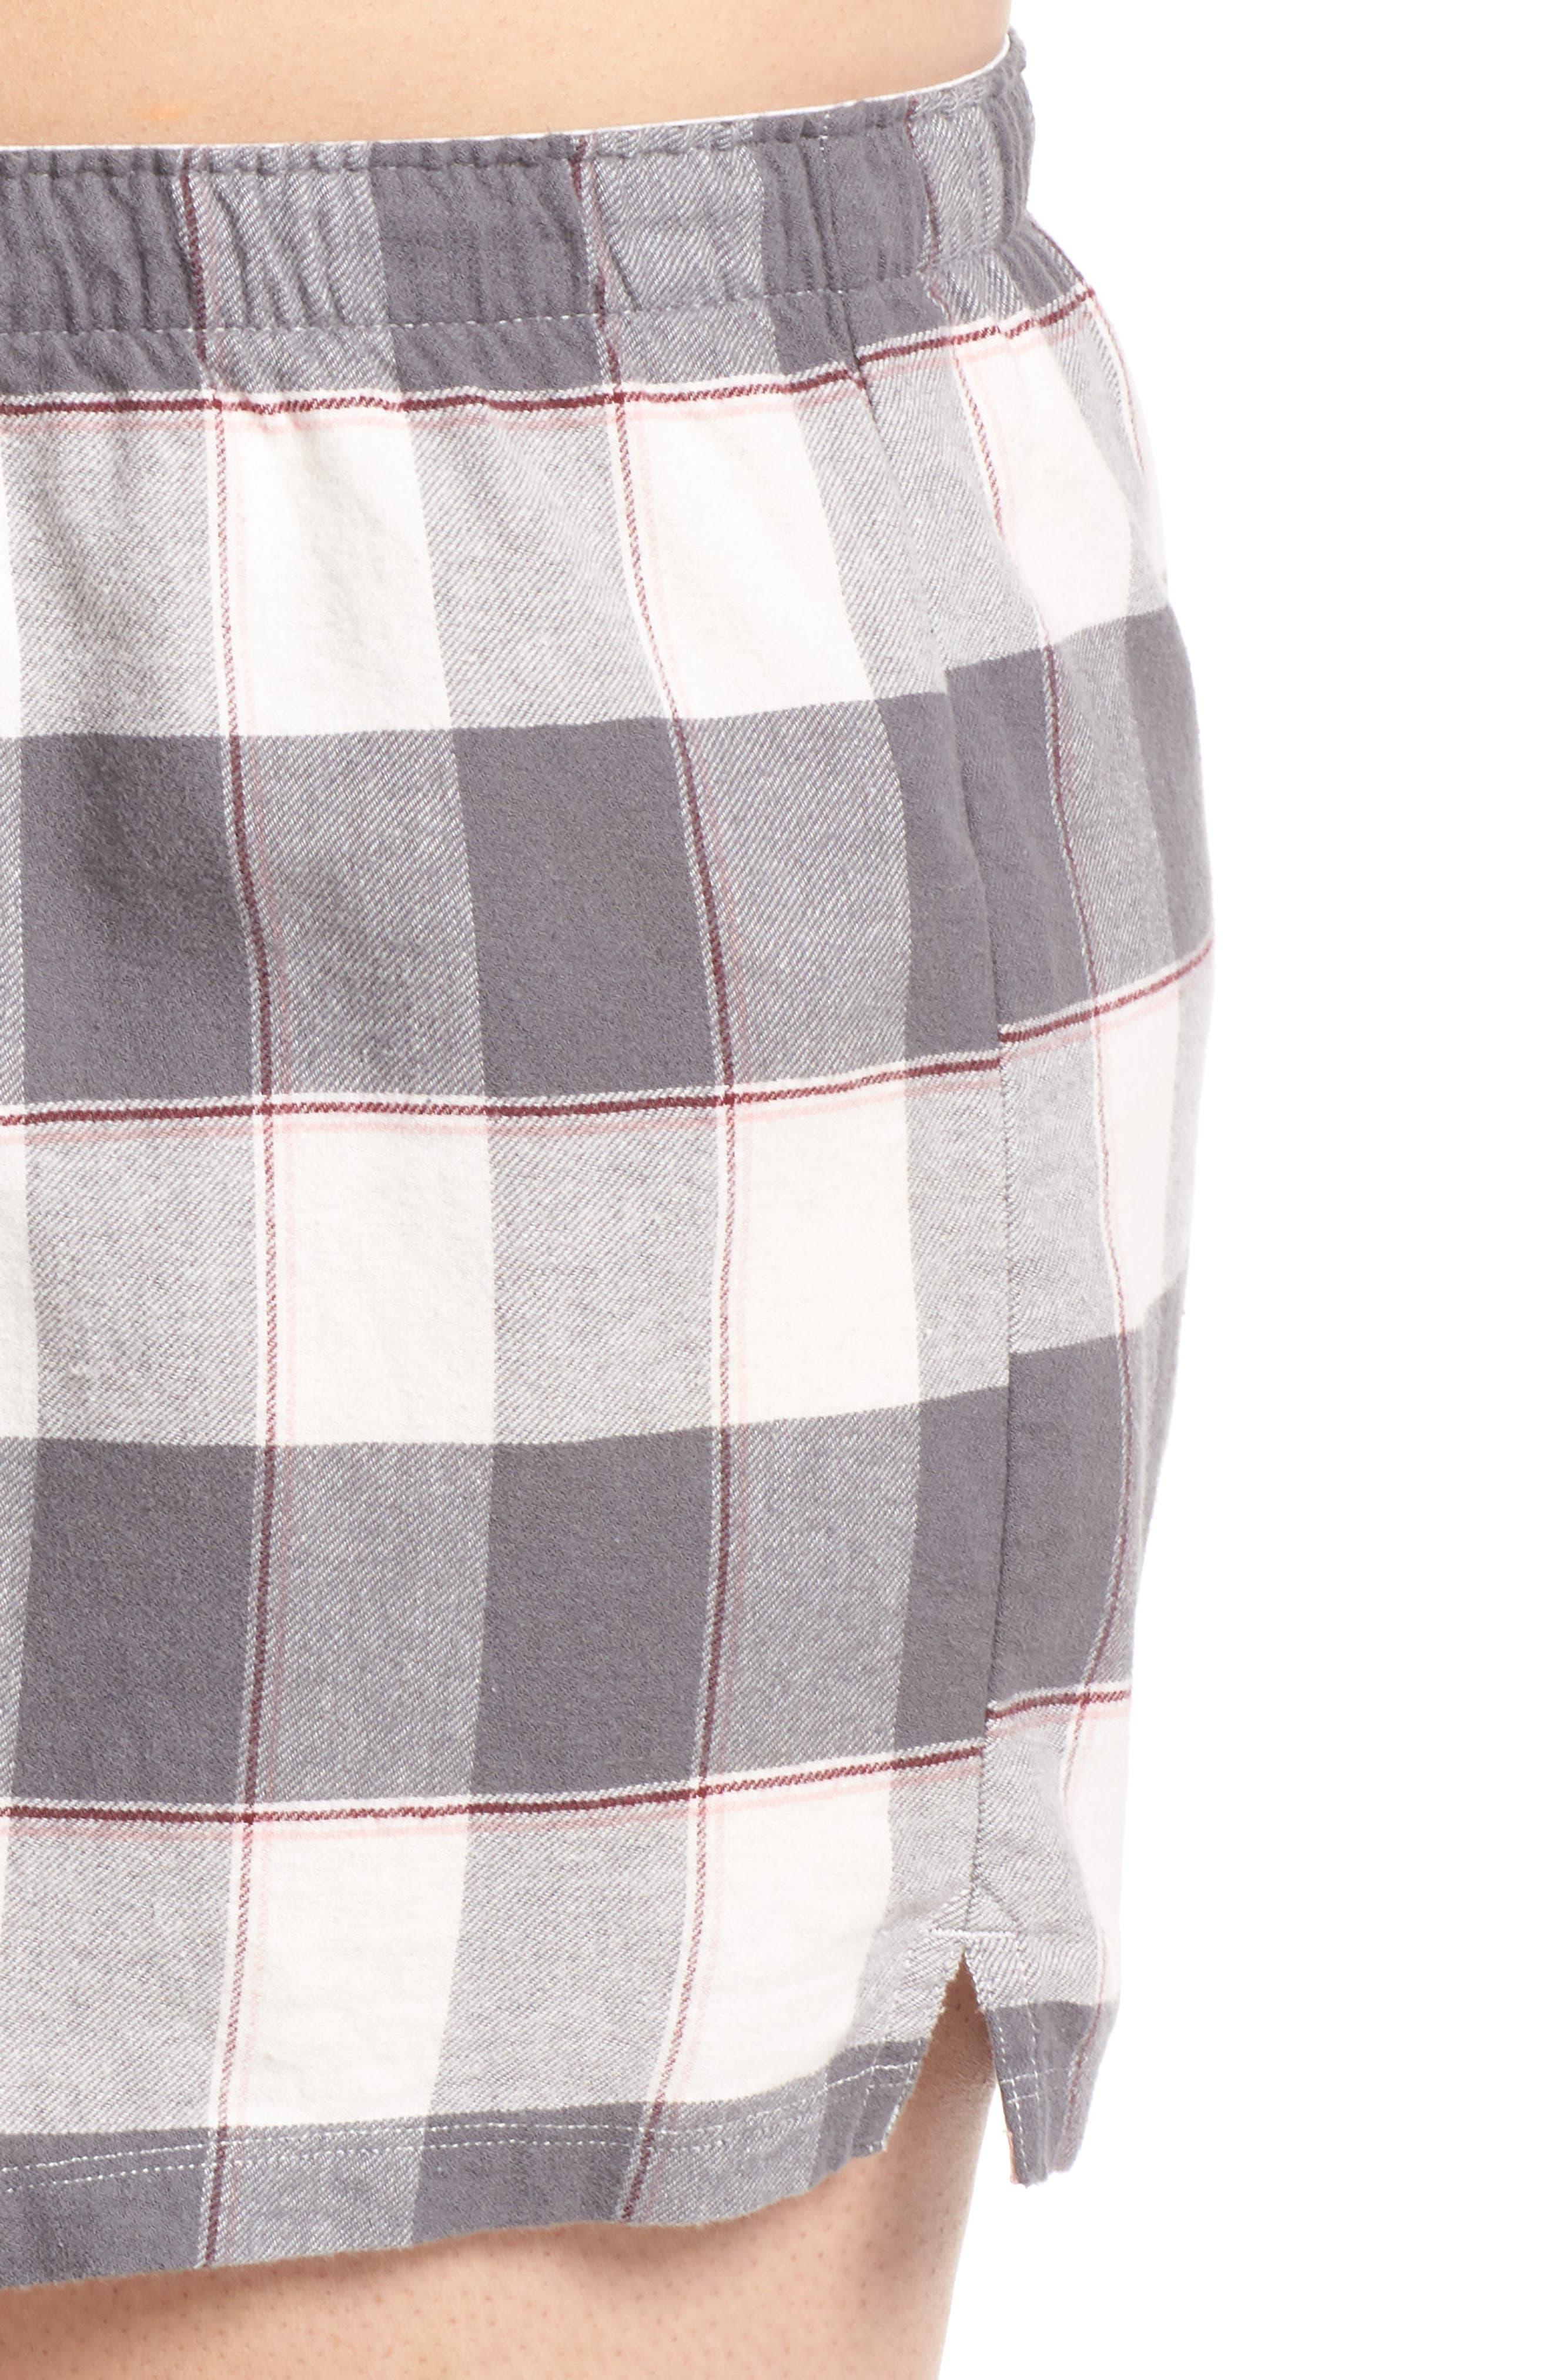 Cozy Time Shorts,                             Alternate thumbnail 4, color,                             GREY